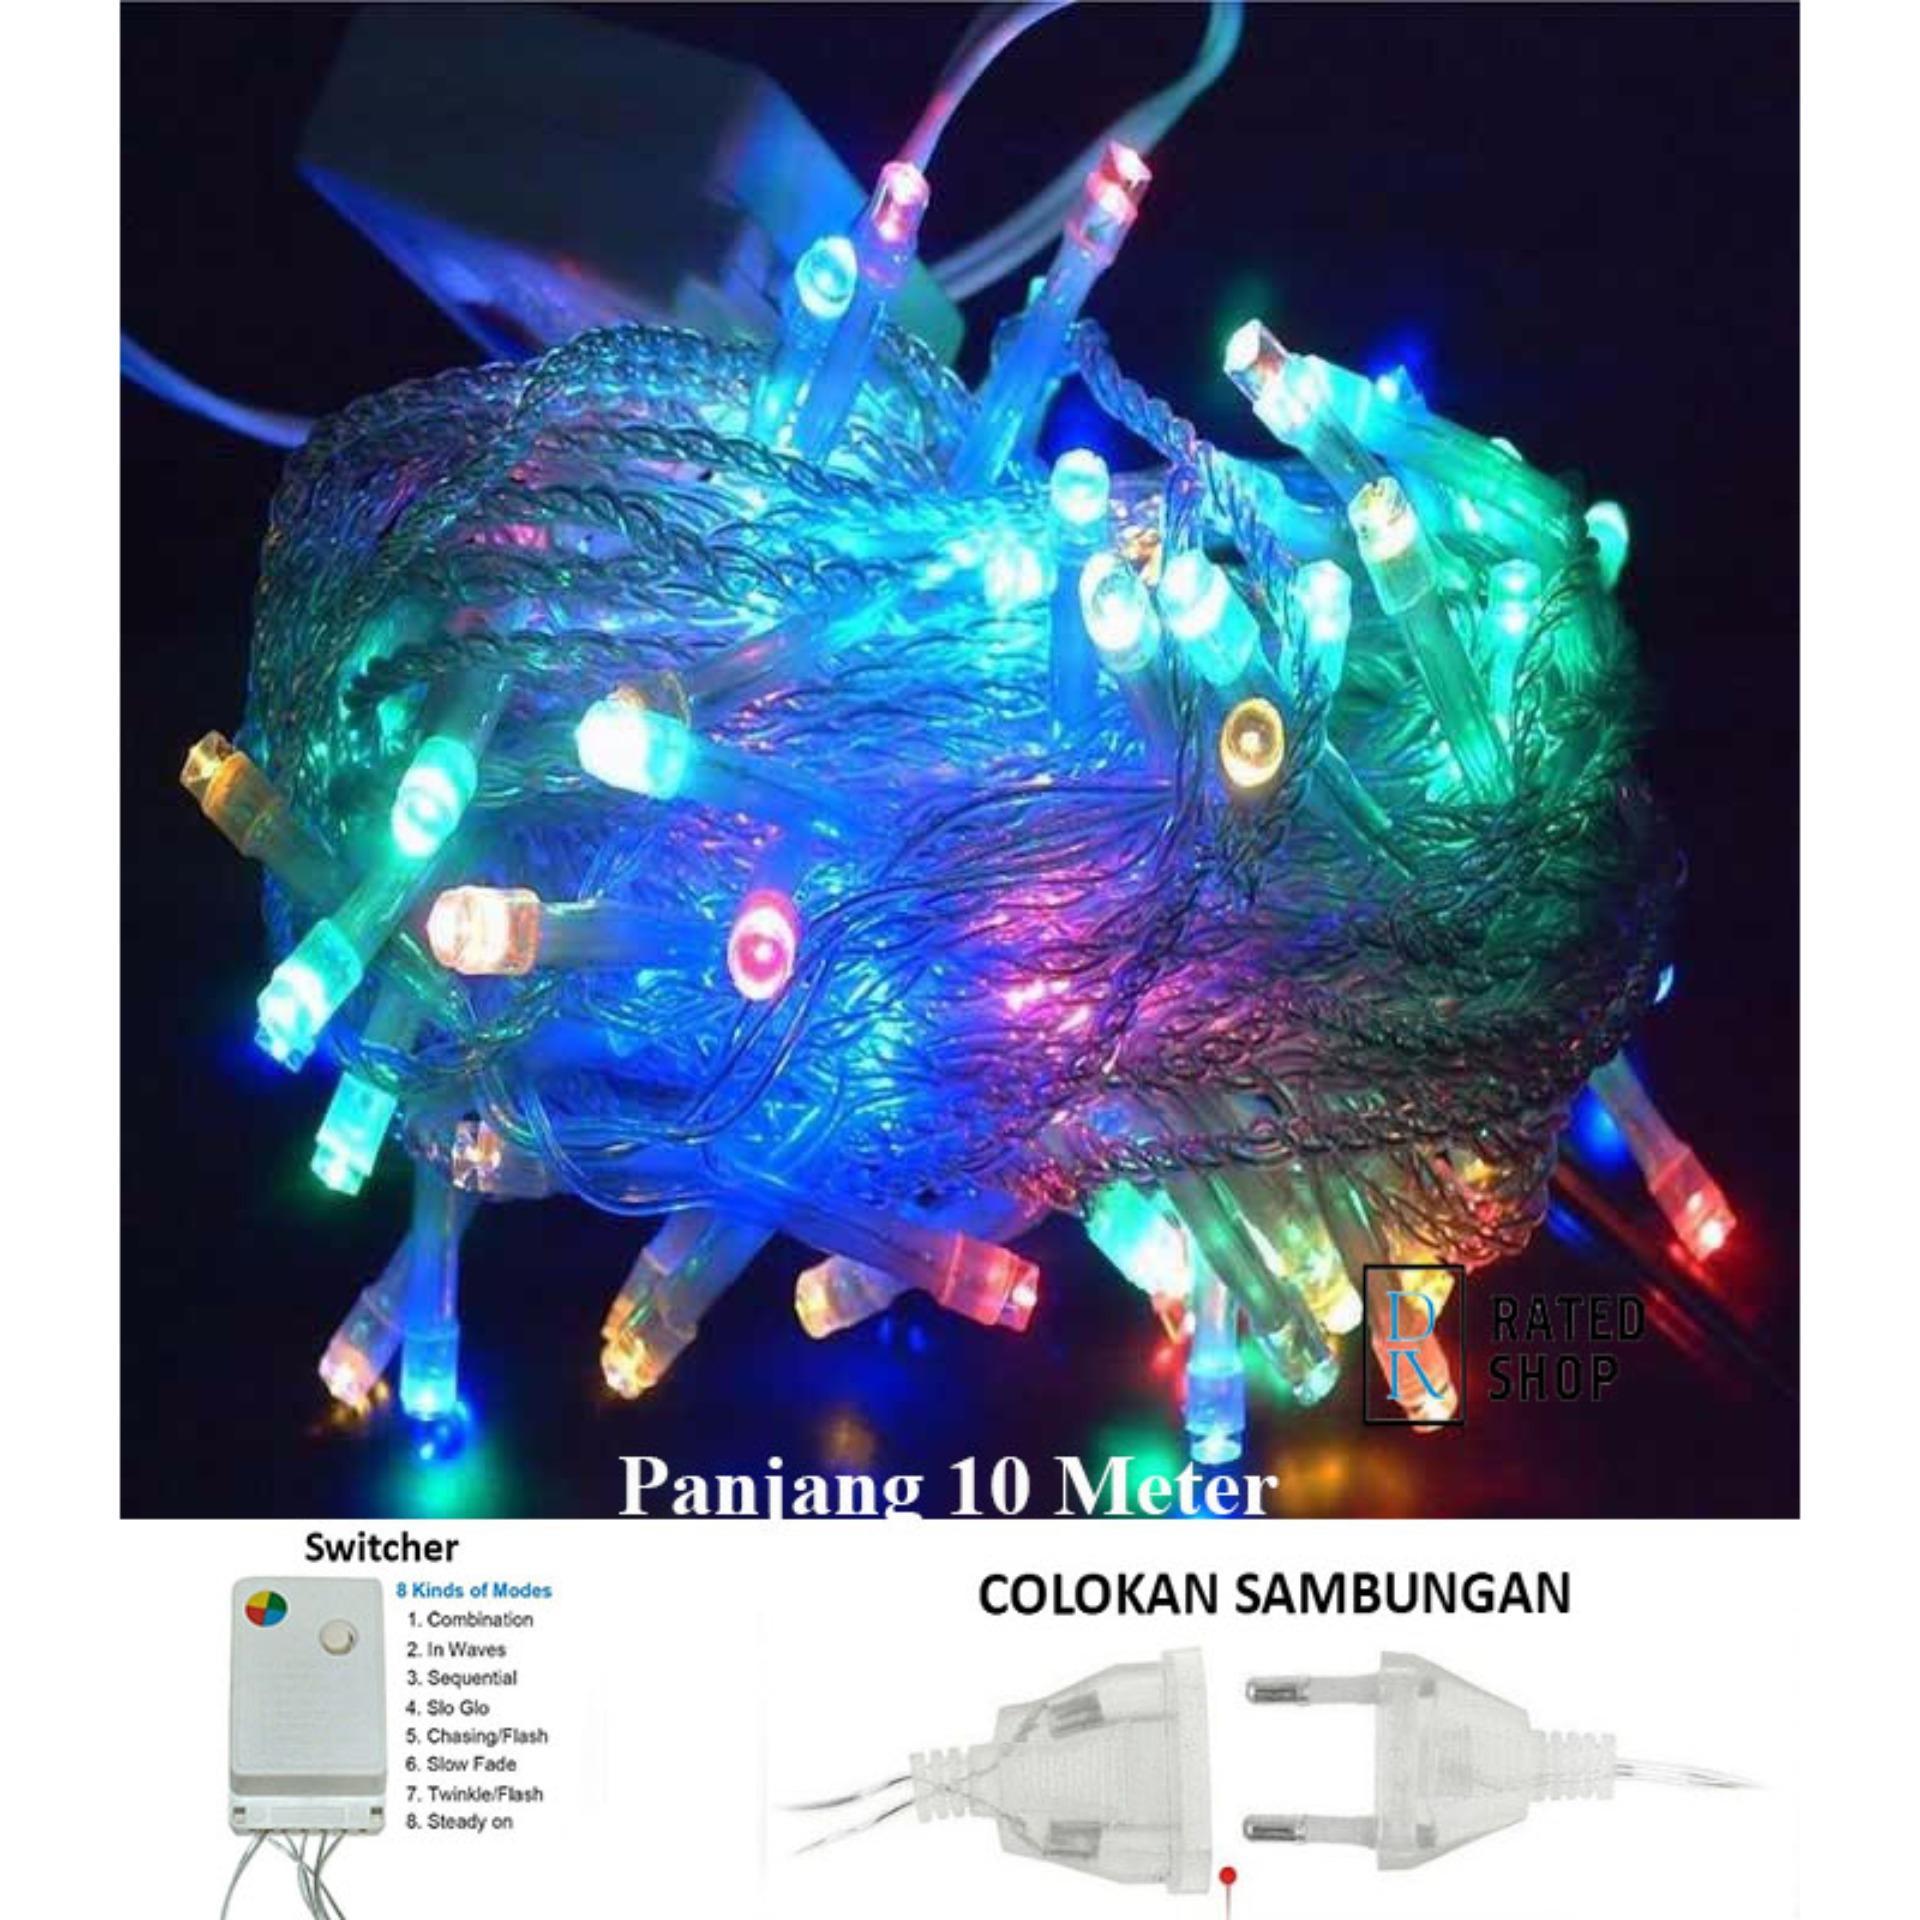 Led Tumblr Lampu Hias Natal LED RGB (Red+Green+Blue+Yellow) 10 Meter + Colokan sambungan – Rainbow